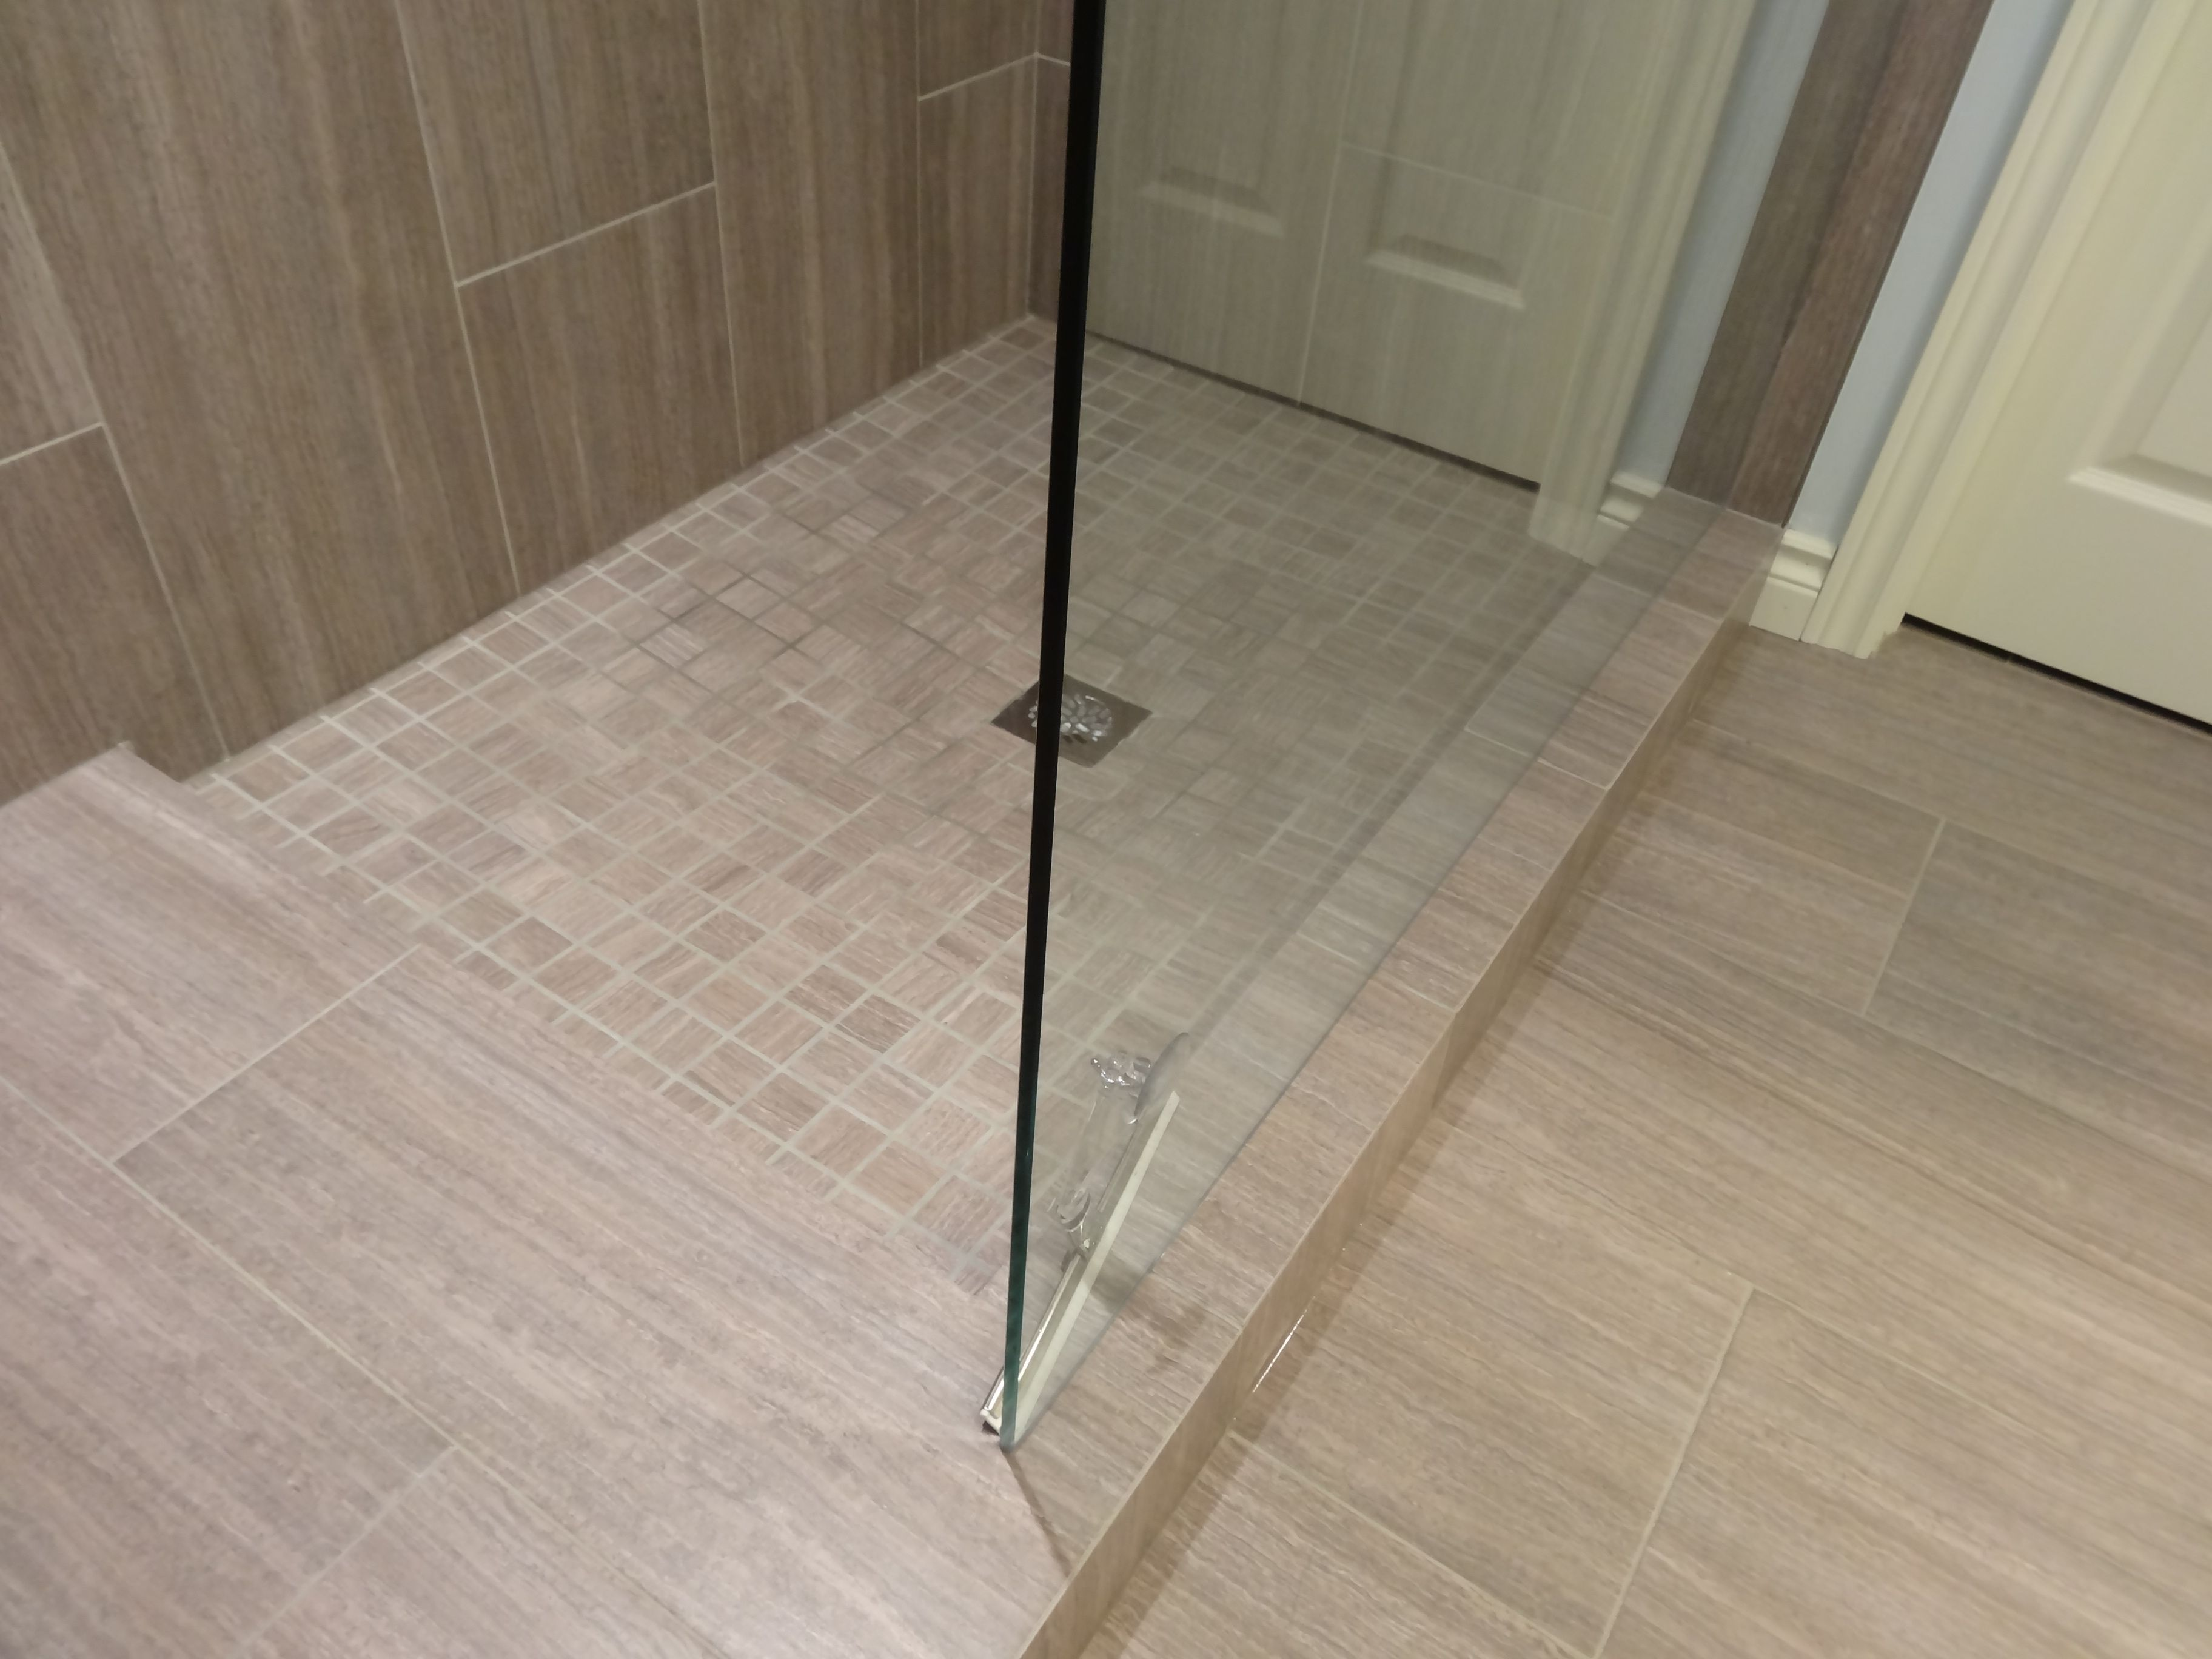 custom shower doorless shower glass wall custom shower base with custom shower doorless shower glass wall custom shower base with platform mitred tile